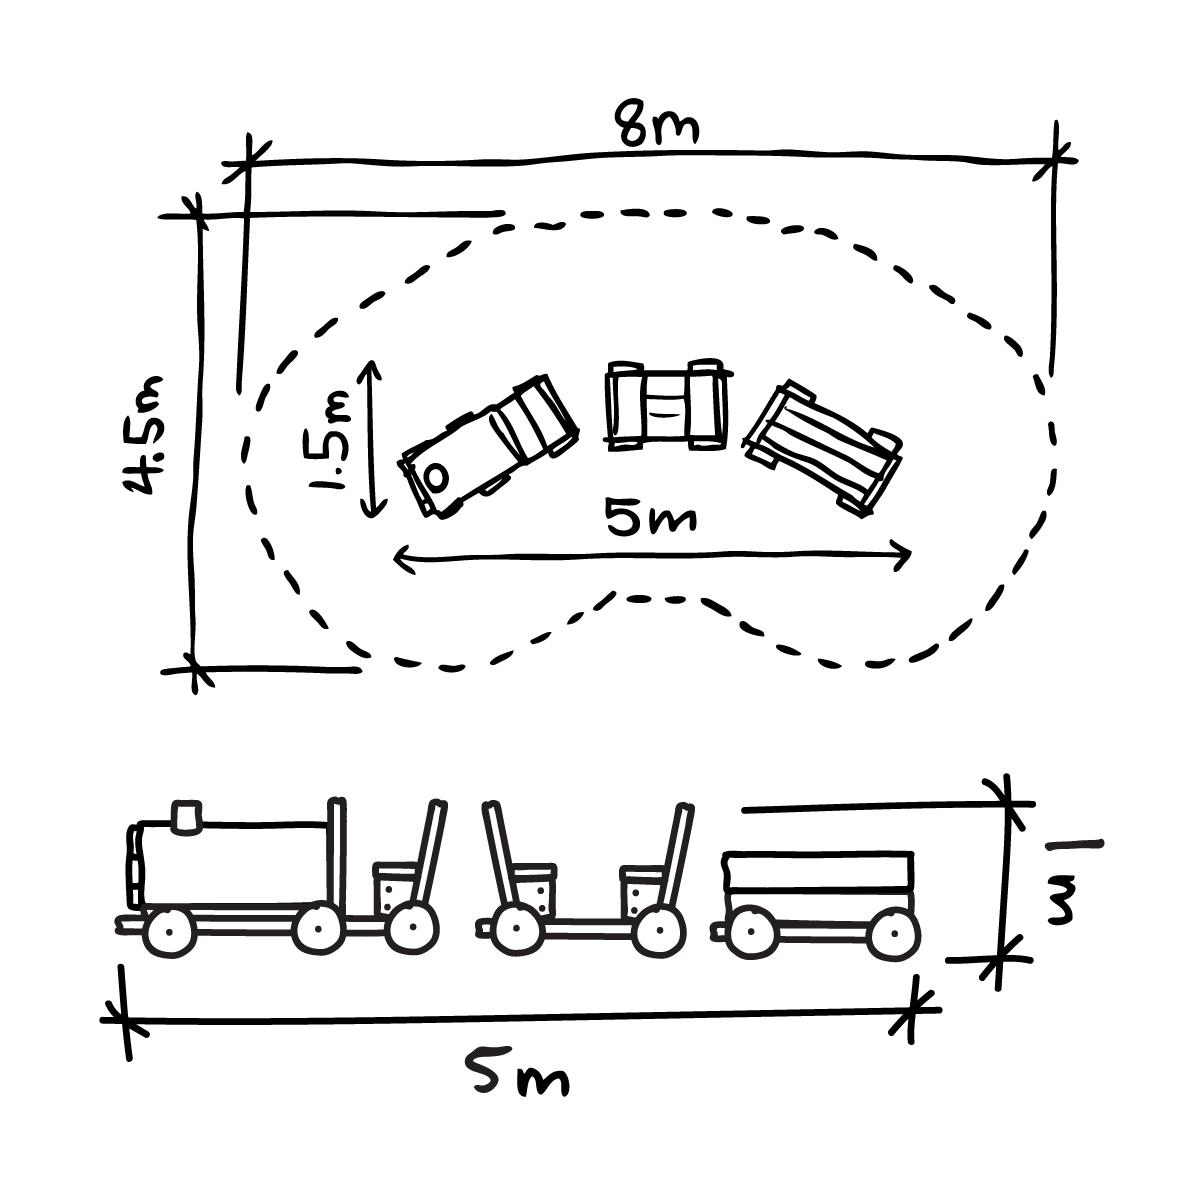 Train Set - 1 Engine, 1 Carriage, 1 Freight Car